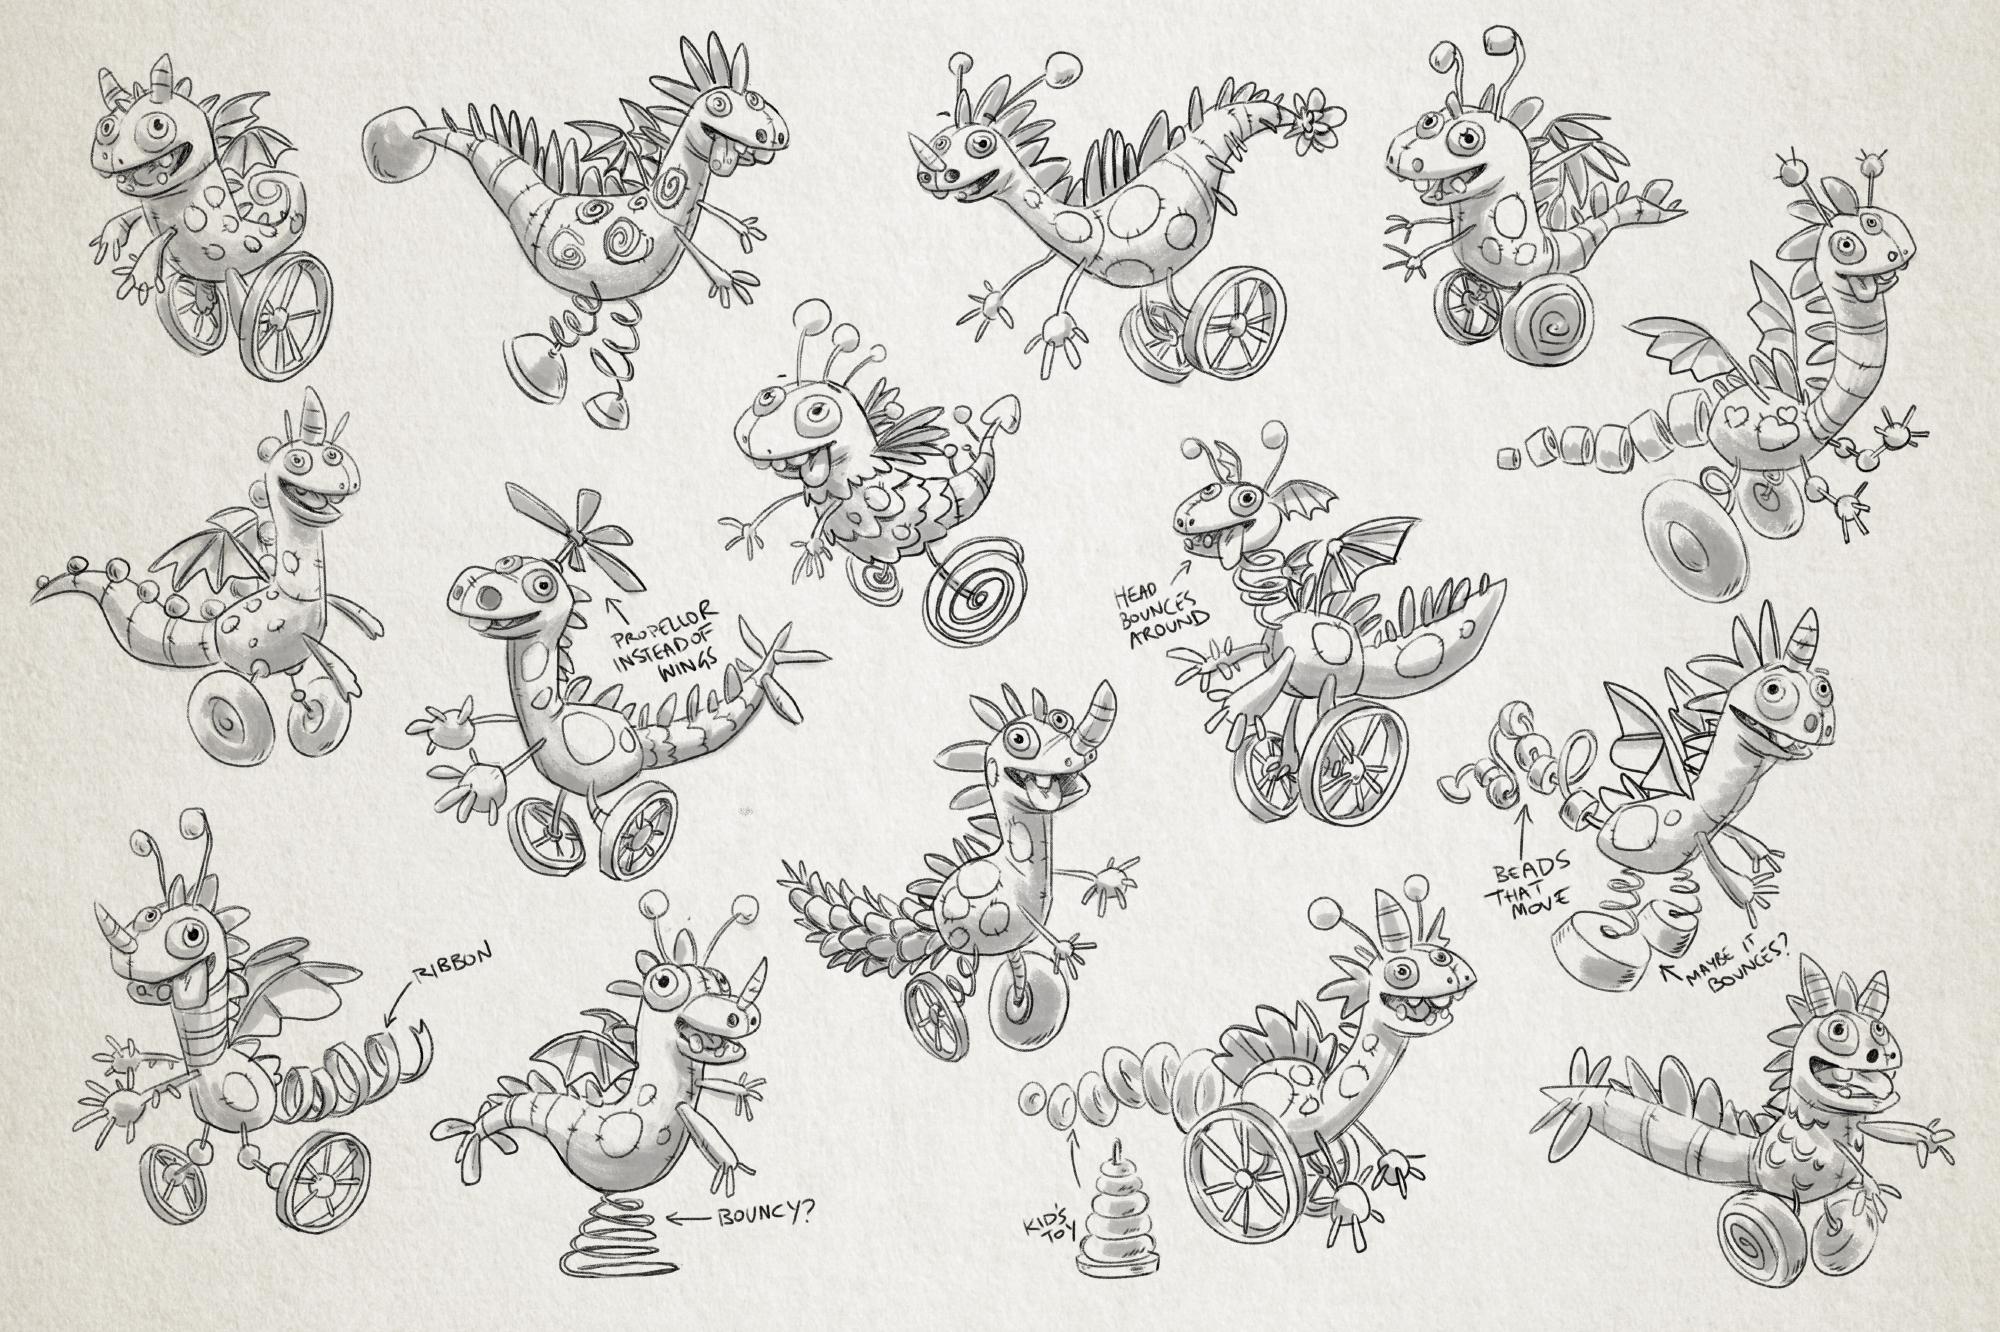 DinoSketches_002.jpg